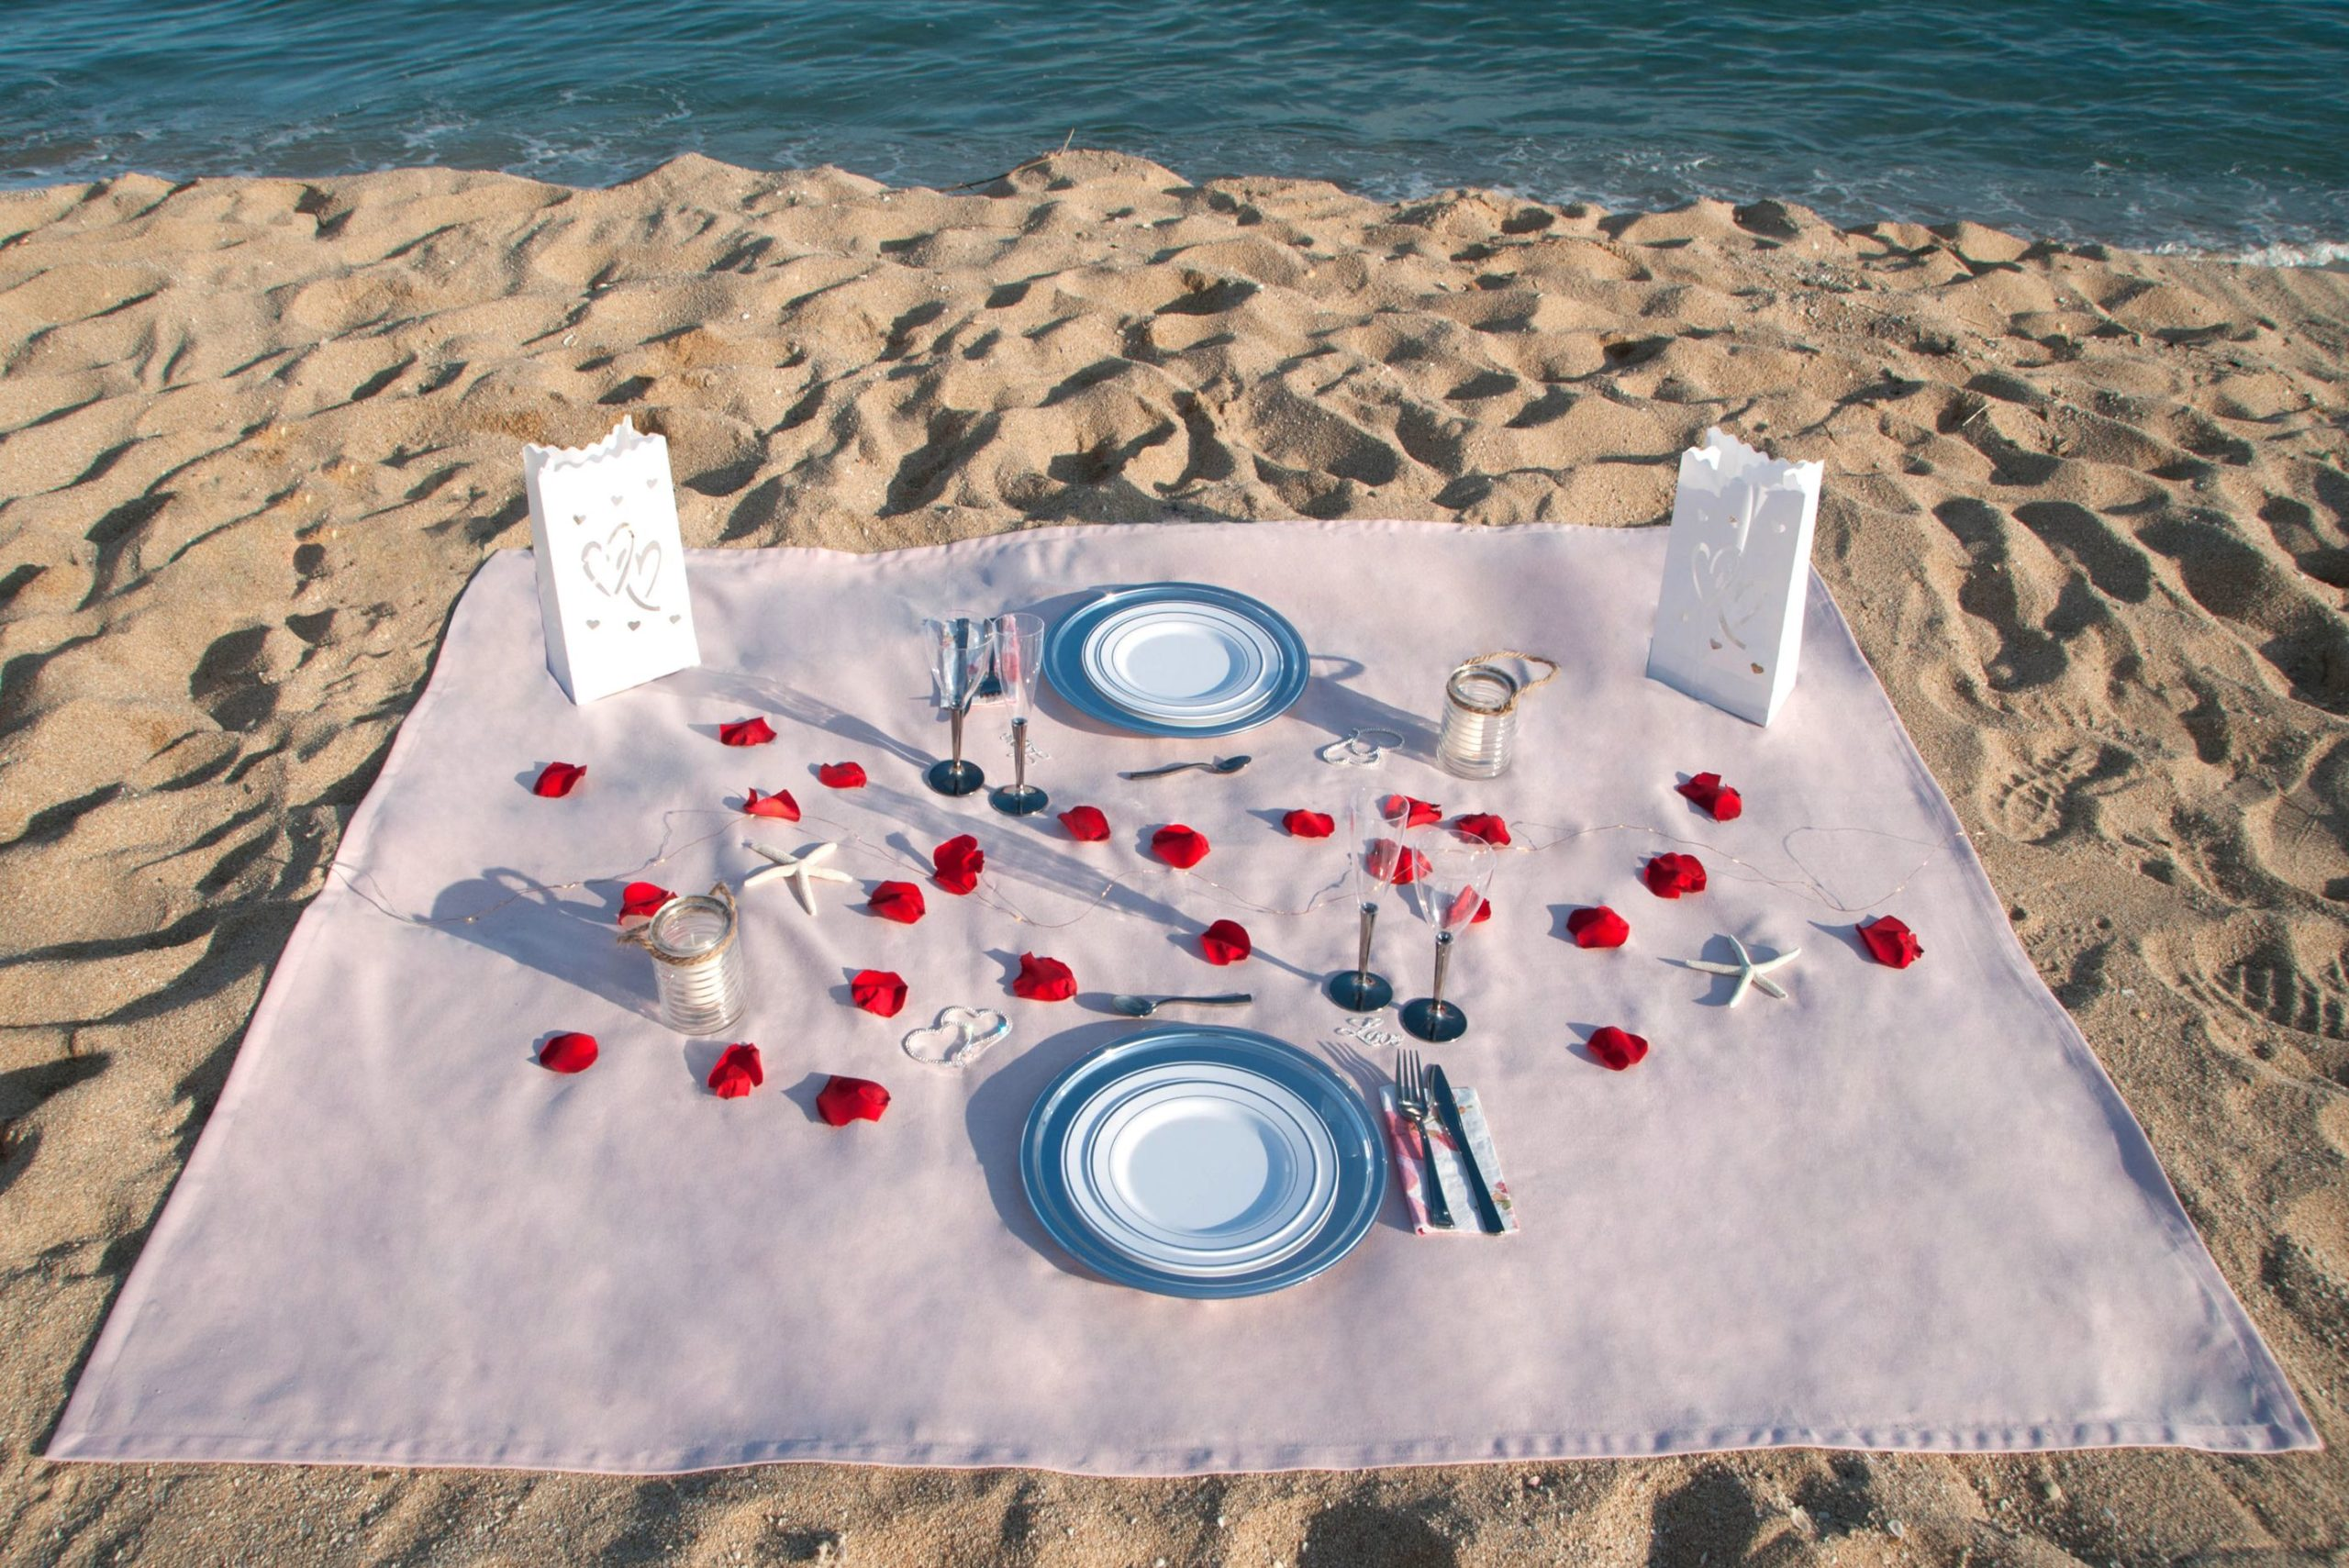 Picnic Romántico Playa - Vendaval Outdoor Pack - Loverspack